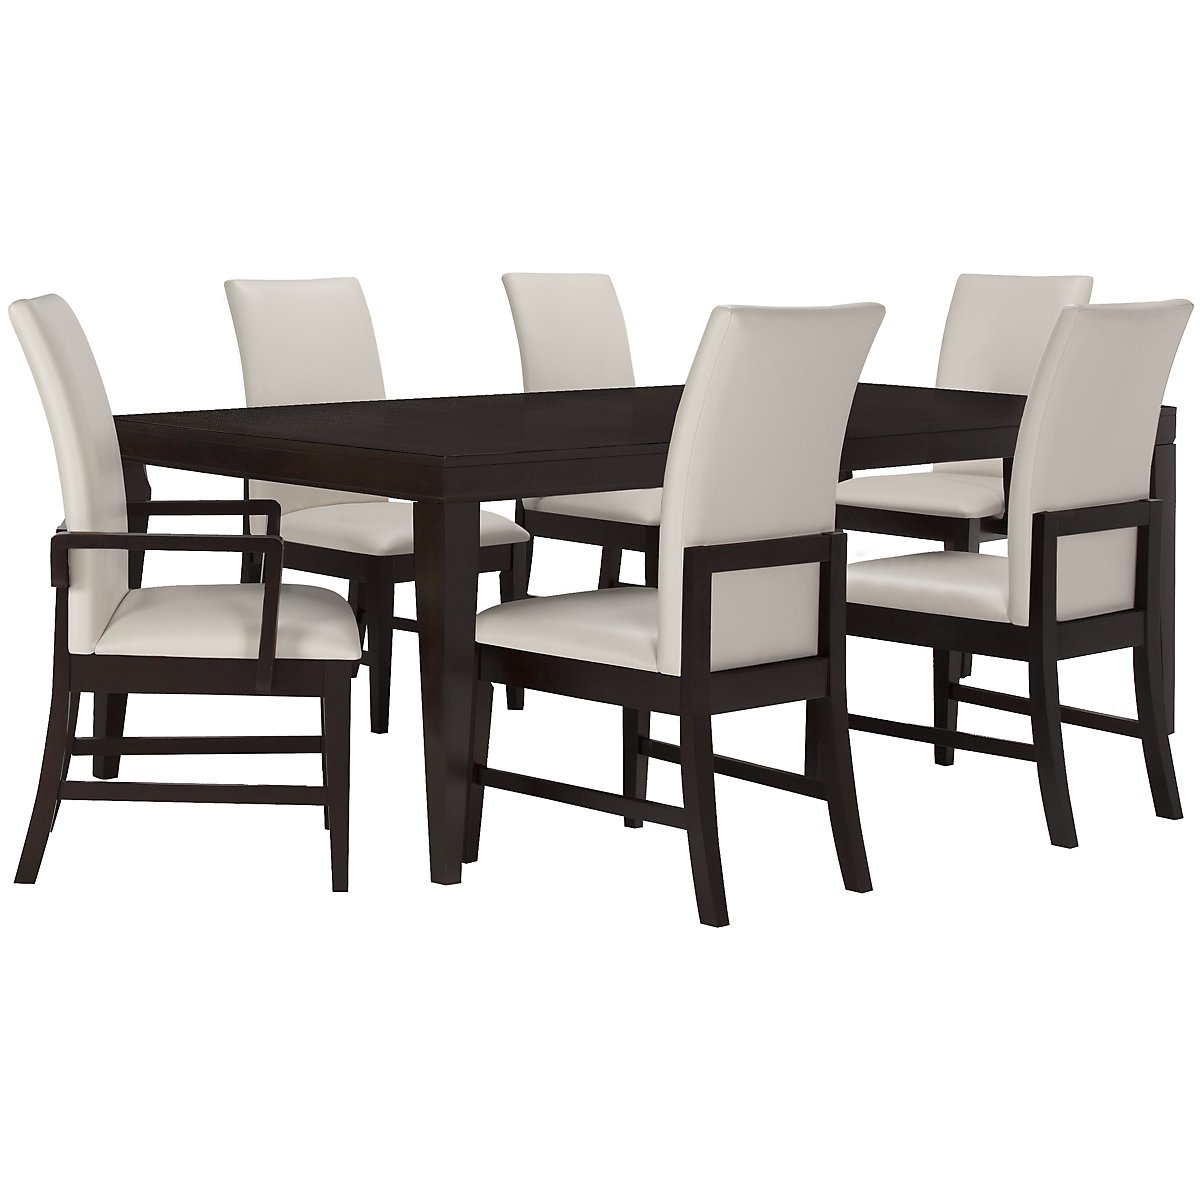 Encore2 Dark Tone Rectangular Table & 4 Upholstered Chairs